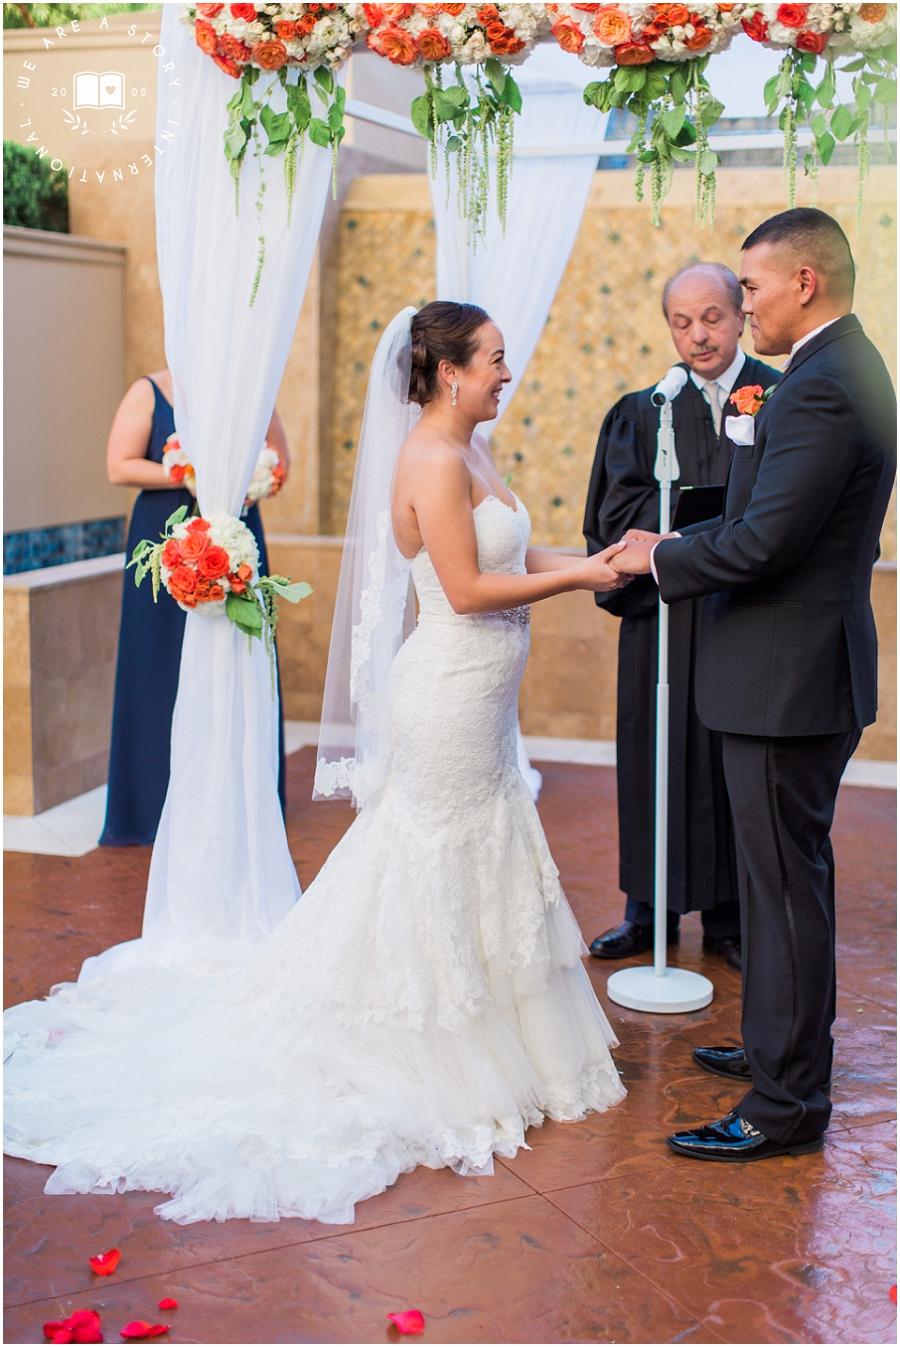 Four Seasons wedding photographer Las Vegas _ We Are A Story wedding photographer_2495.jpg